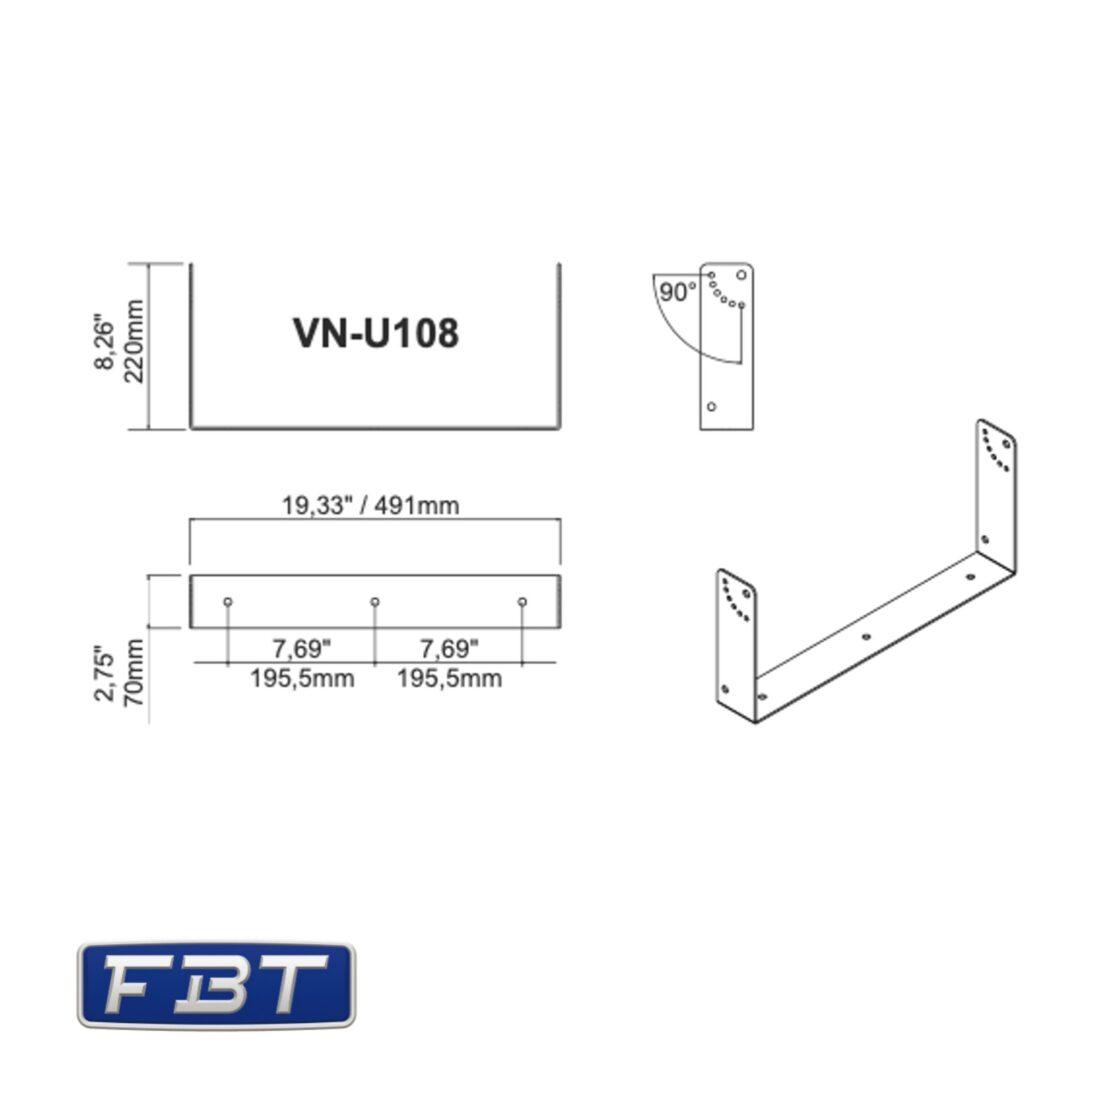 FBT VN-U108 bracket dimensions